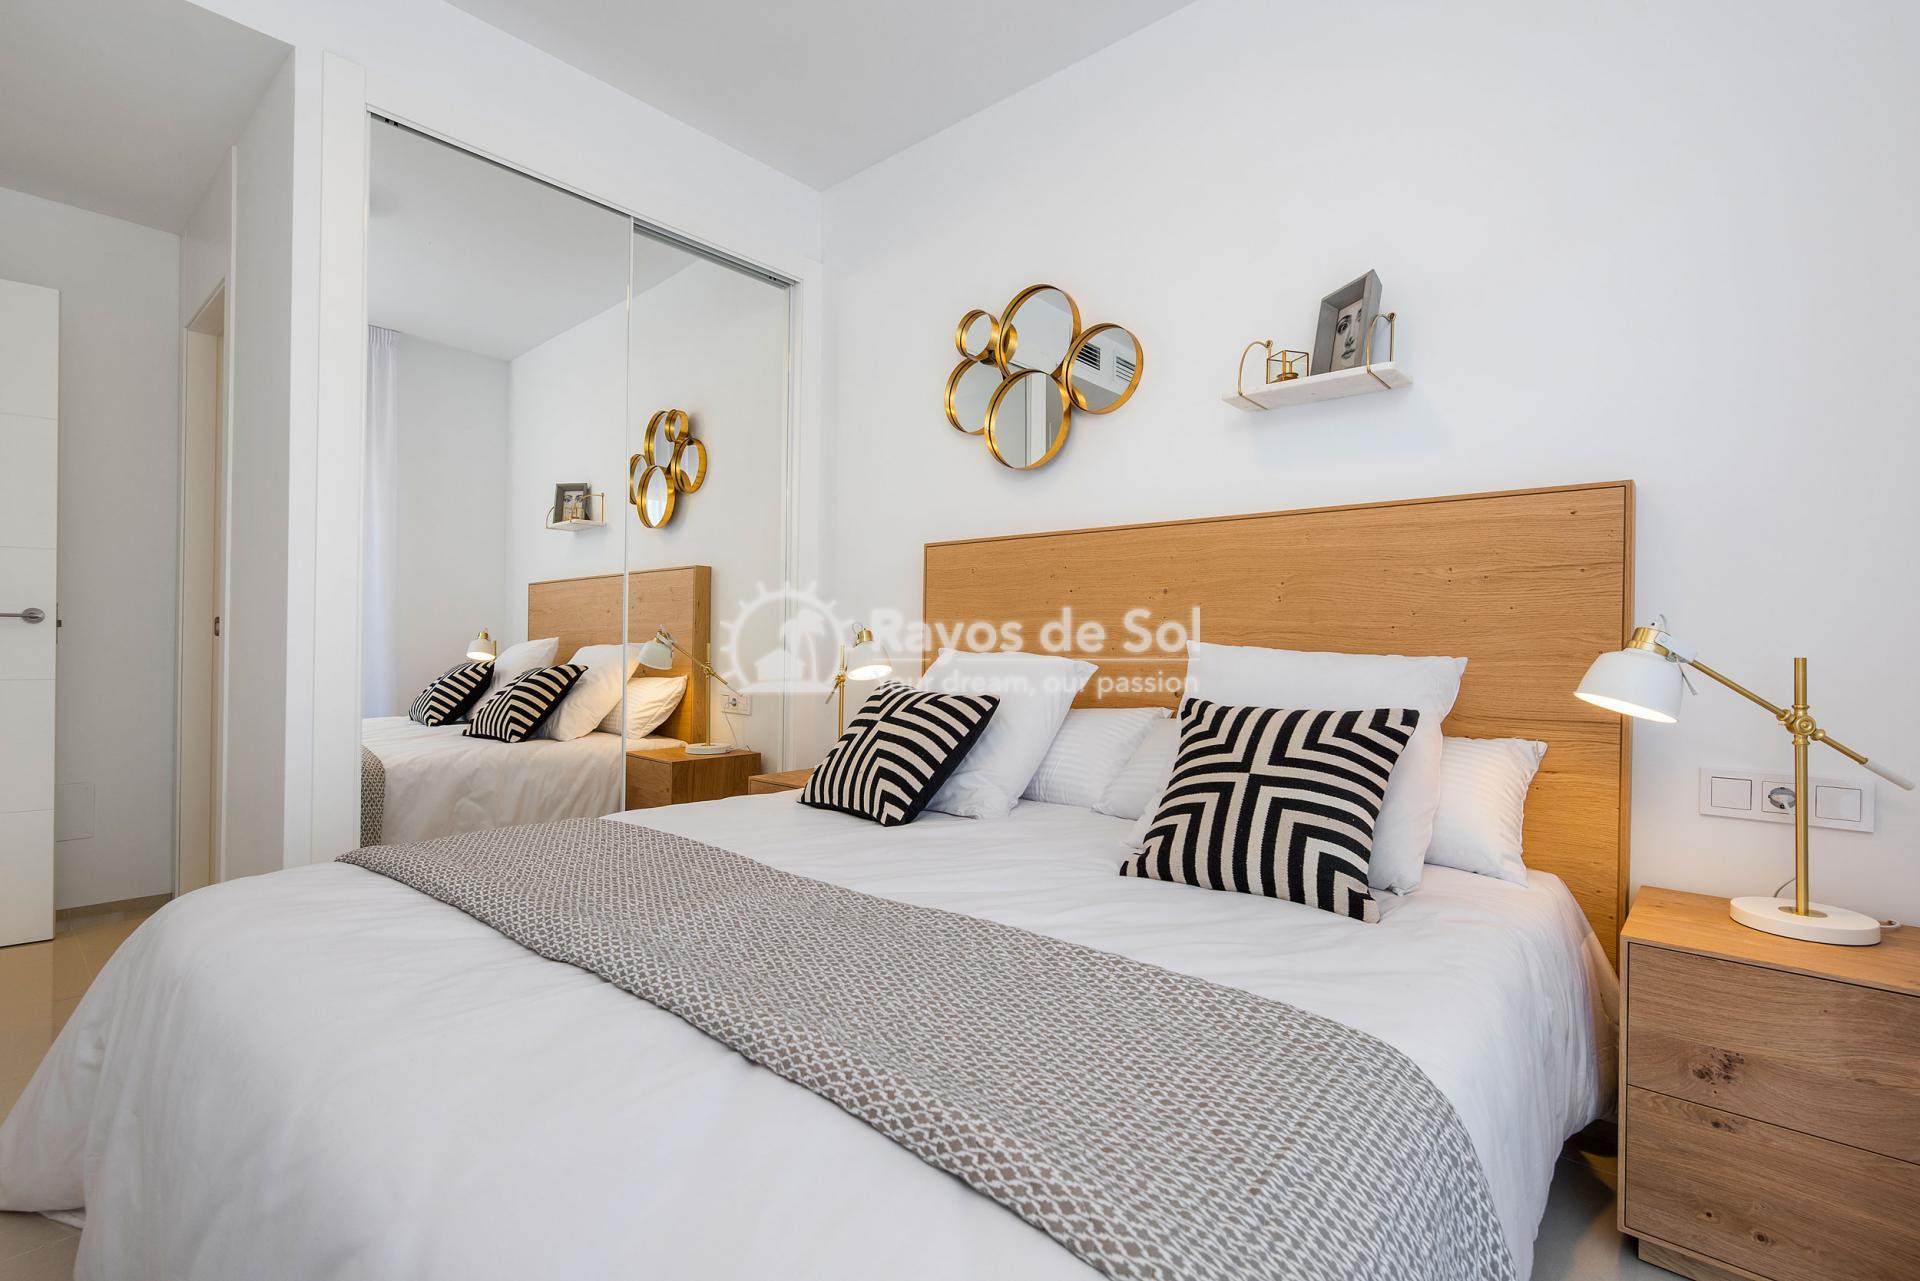 Ground floor apartment  in Doña Pepa, Ciudad Quesada, Costa Blanca (Allegra-olivos-bg-3-2) - 12